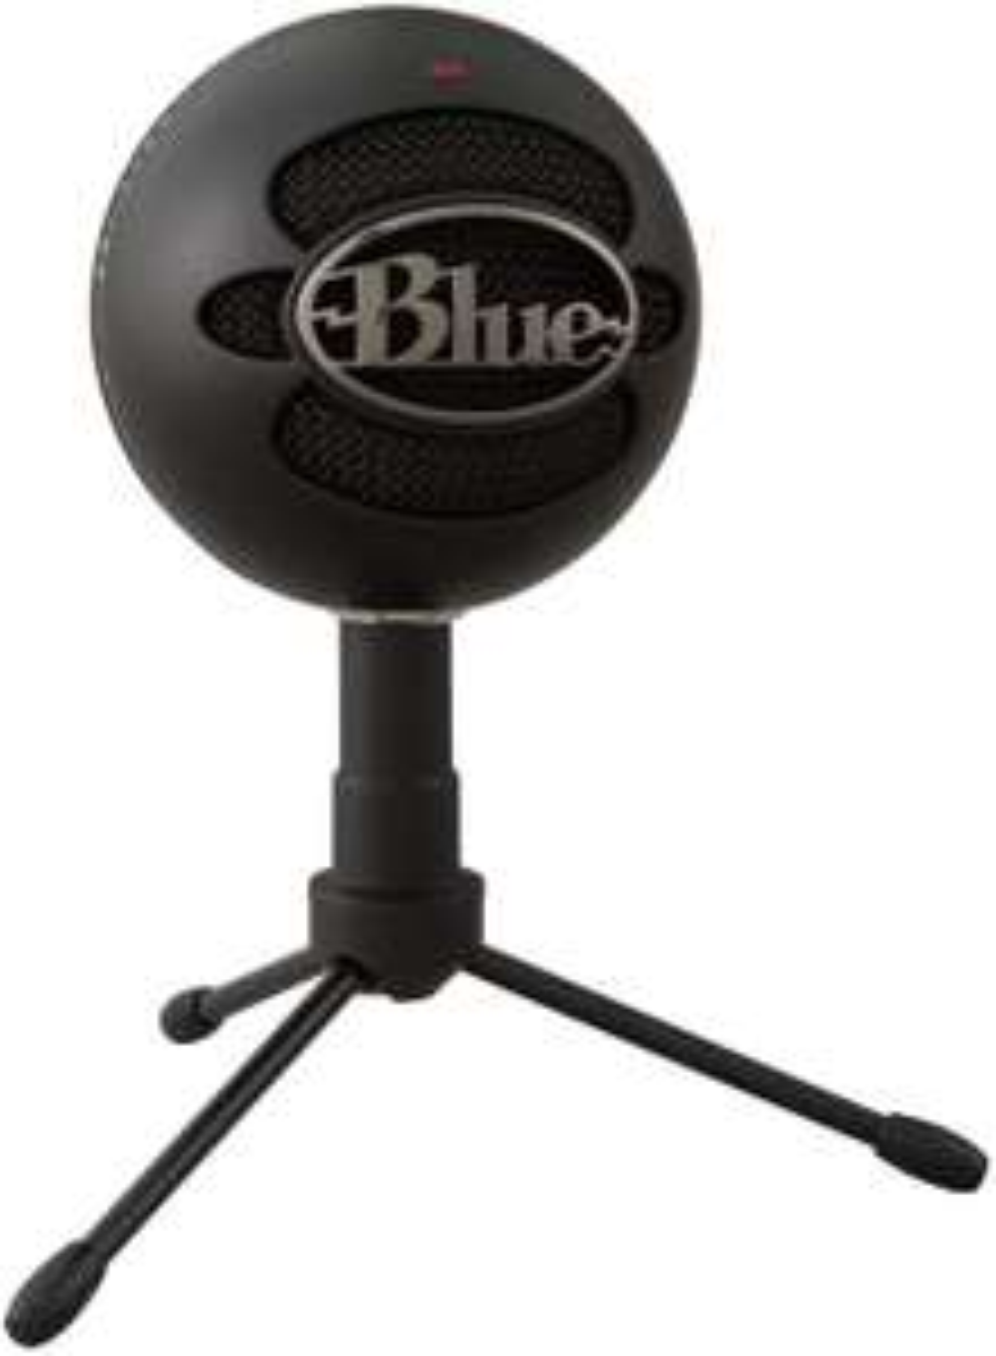 Blue Microphones Snowball USB-Mikrofon (Niere oder Kugel, 3 Modi, 40Hz-18kHz, Tischstativ, Ø325mm, 2m Kabel, 460g)